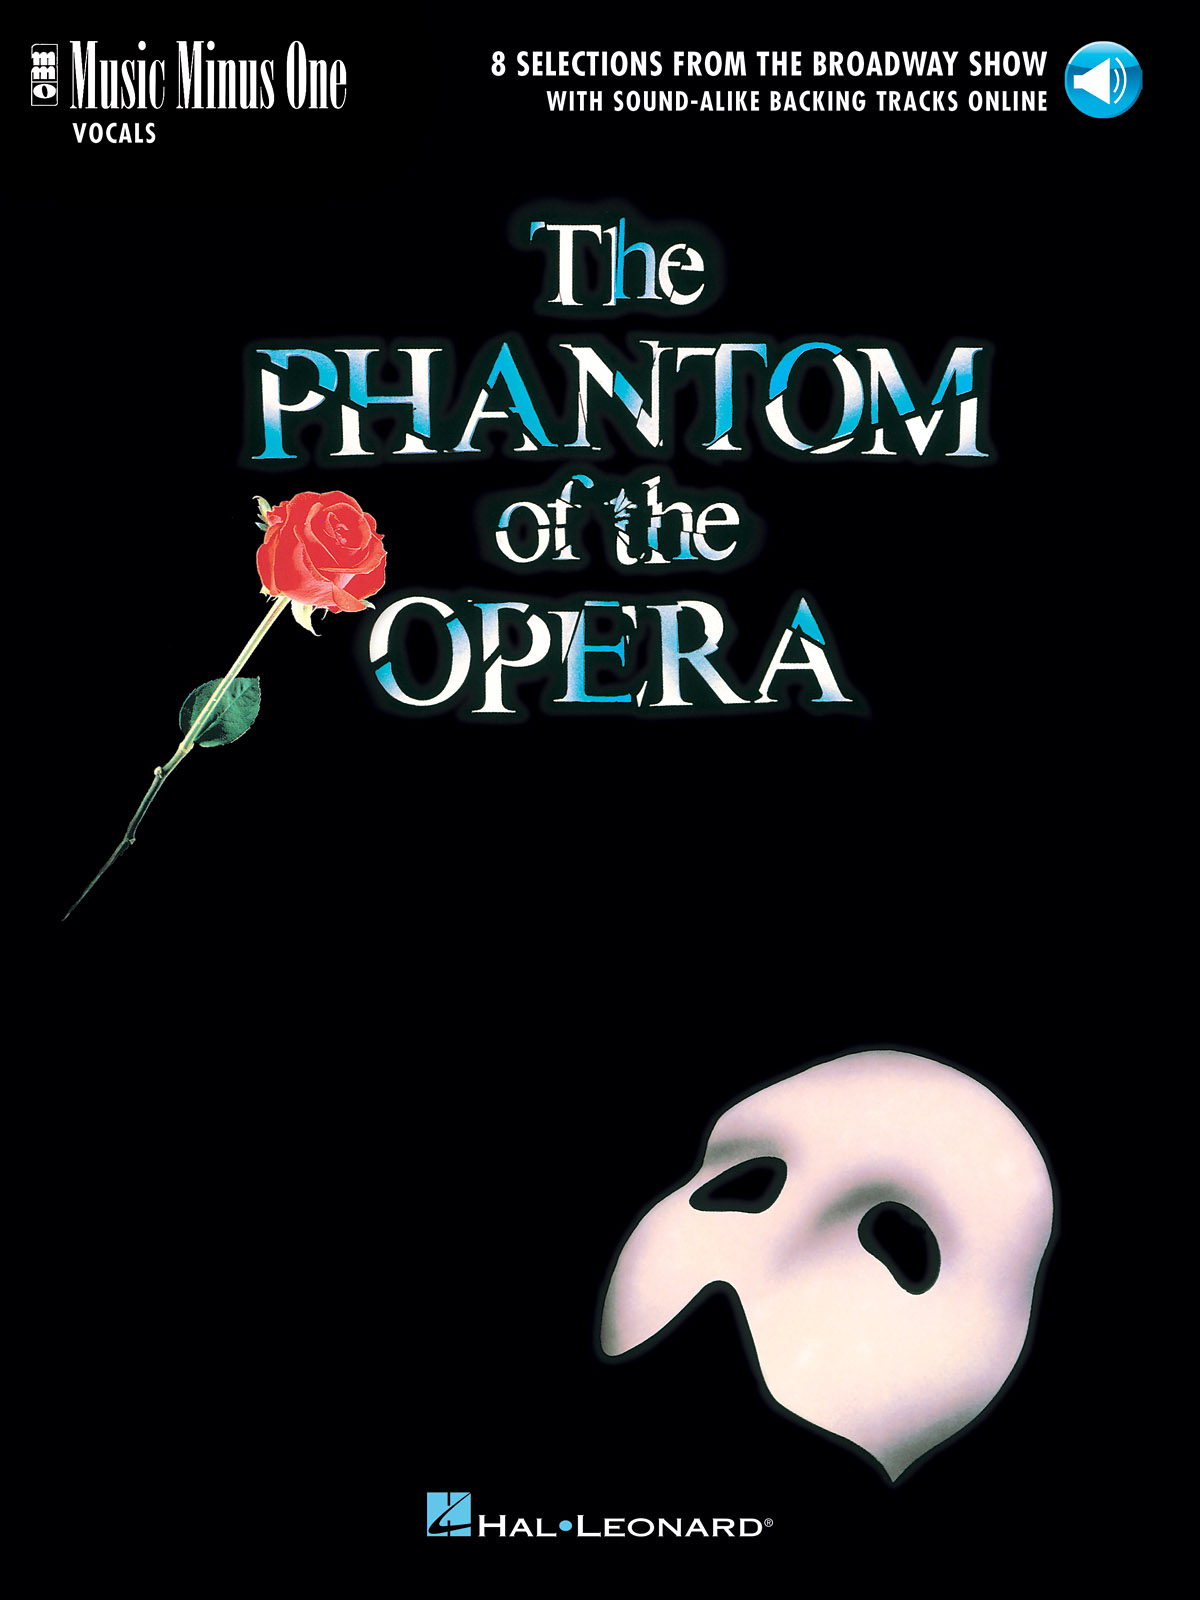 The Phantom Of The Opera - Music Minus One Vocal (Music Minus One Vocals) (Includes Online Access Code)